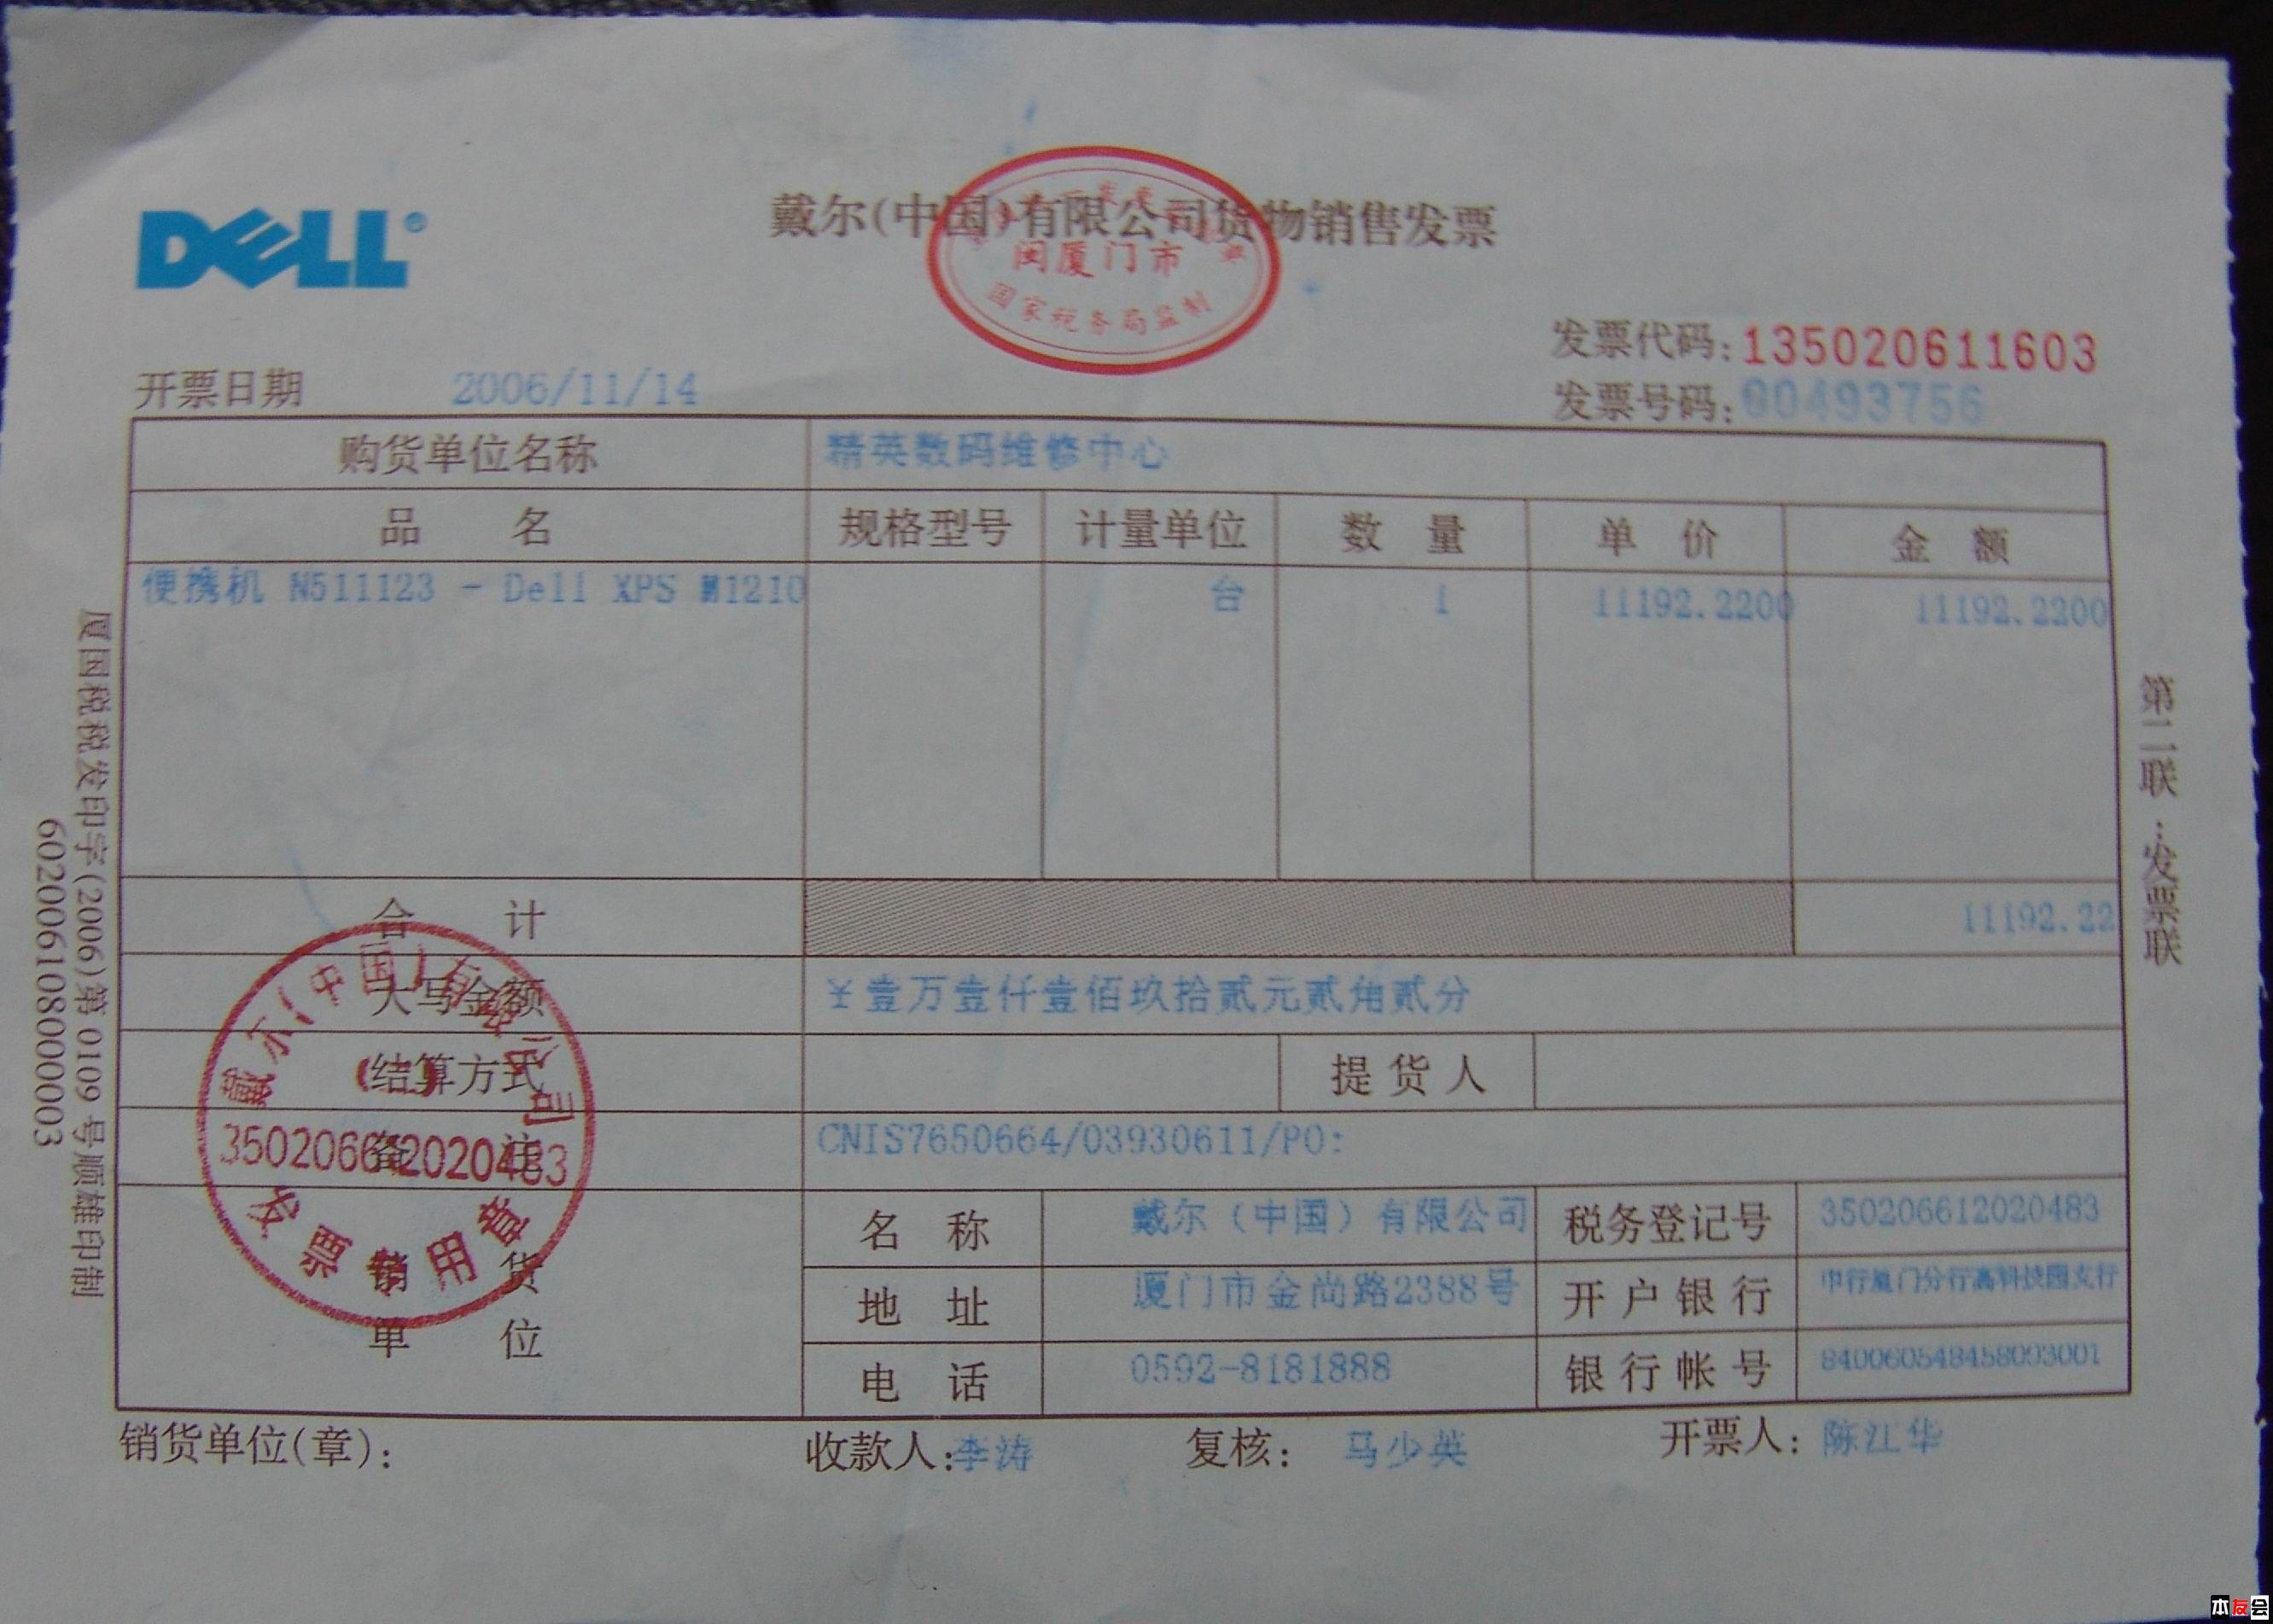 dell 1210s电源电路图